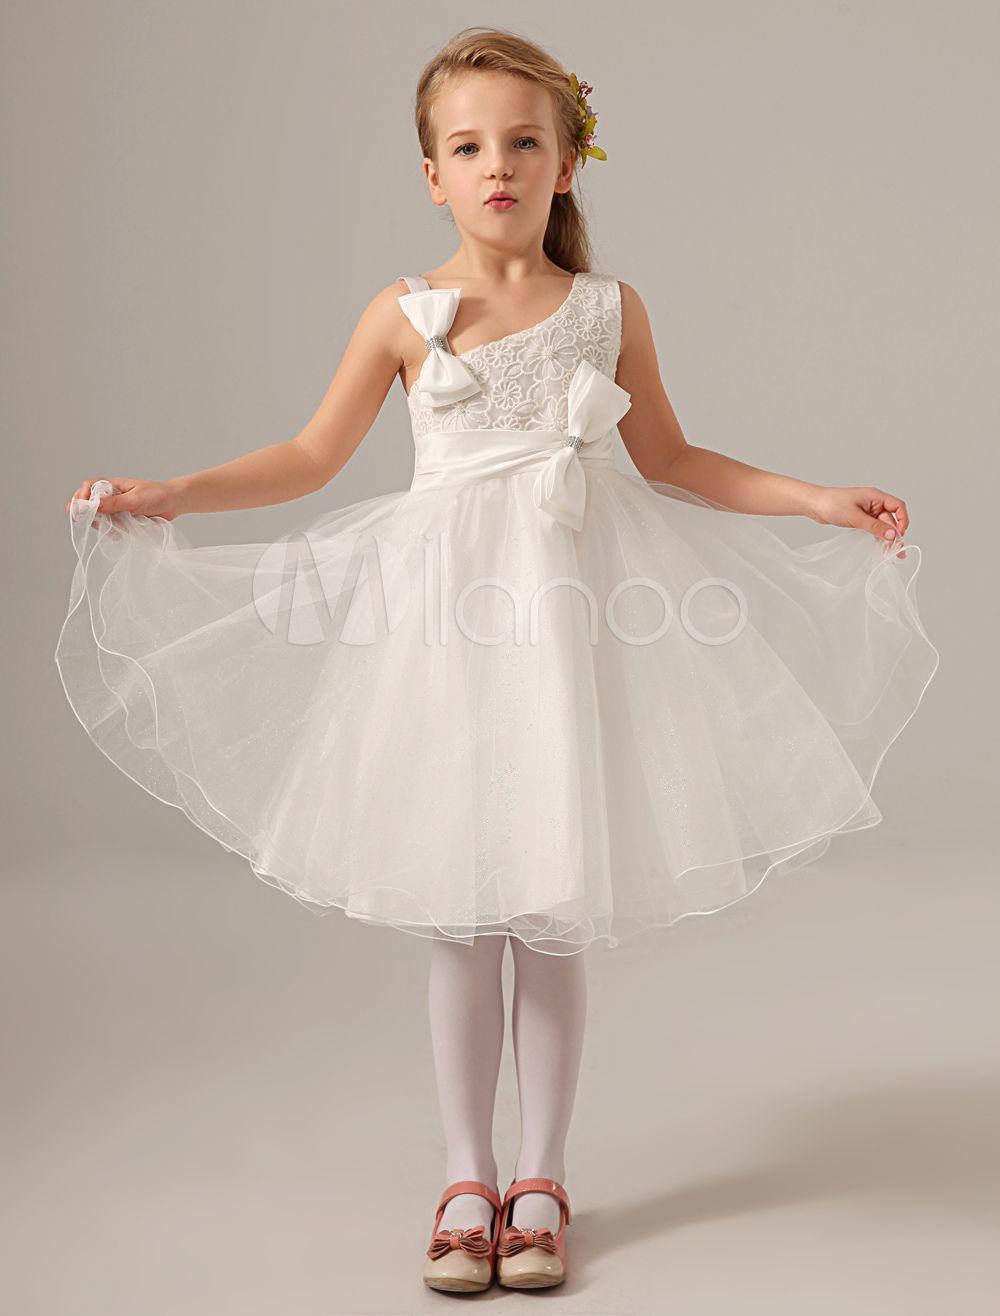 88bcadf36 Ivory One-Shoulder Knee-Length Pearls Organza Flower Girl Dress #Knee, # Length, #Ivory